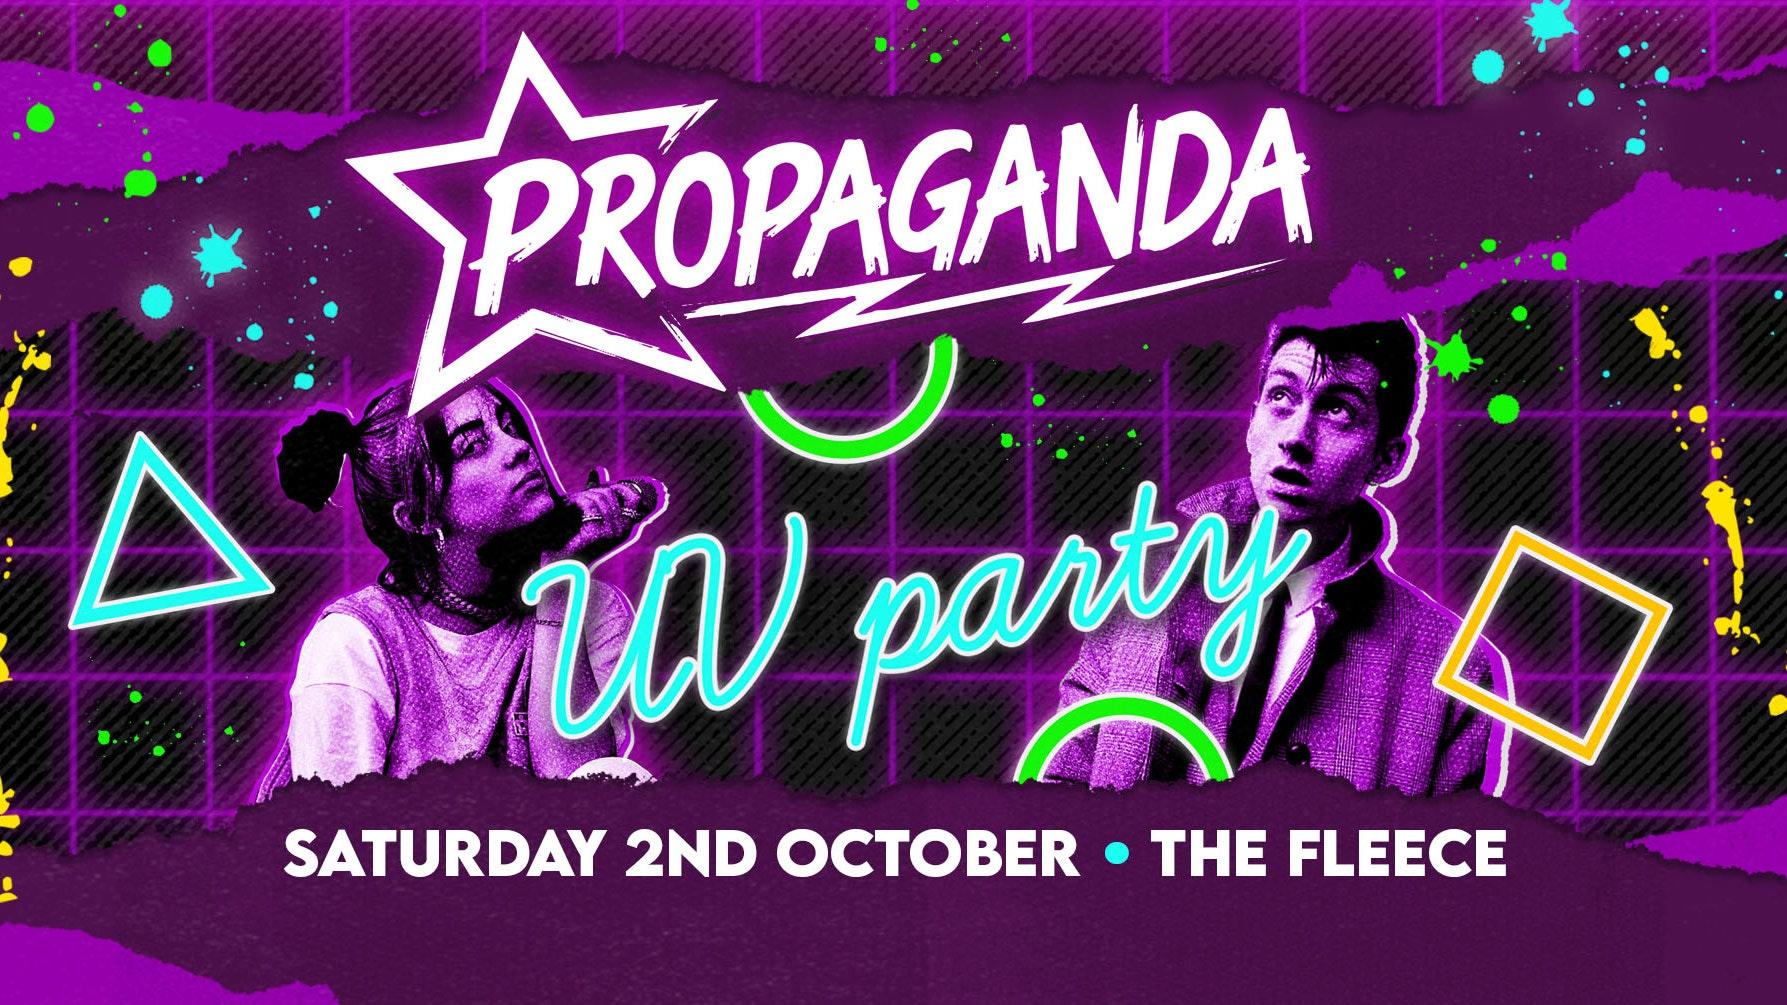 Propaganda Bristol – UV Party!